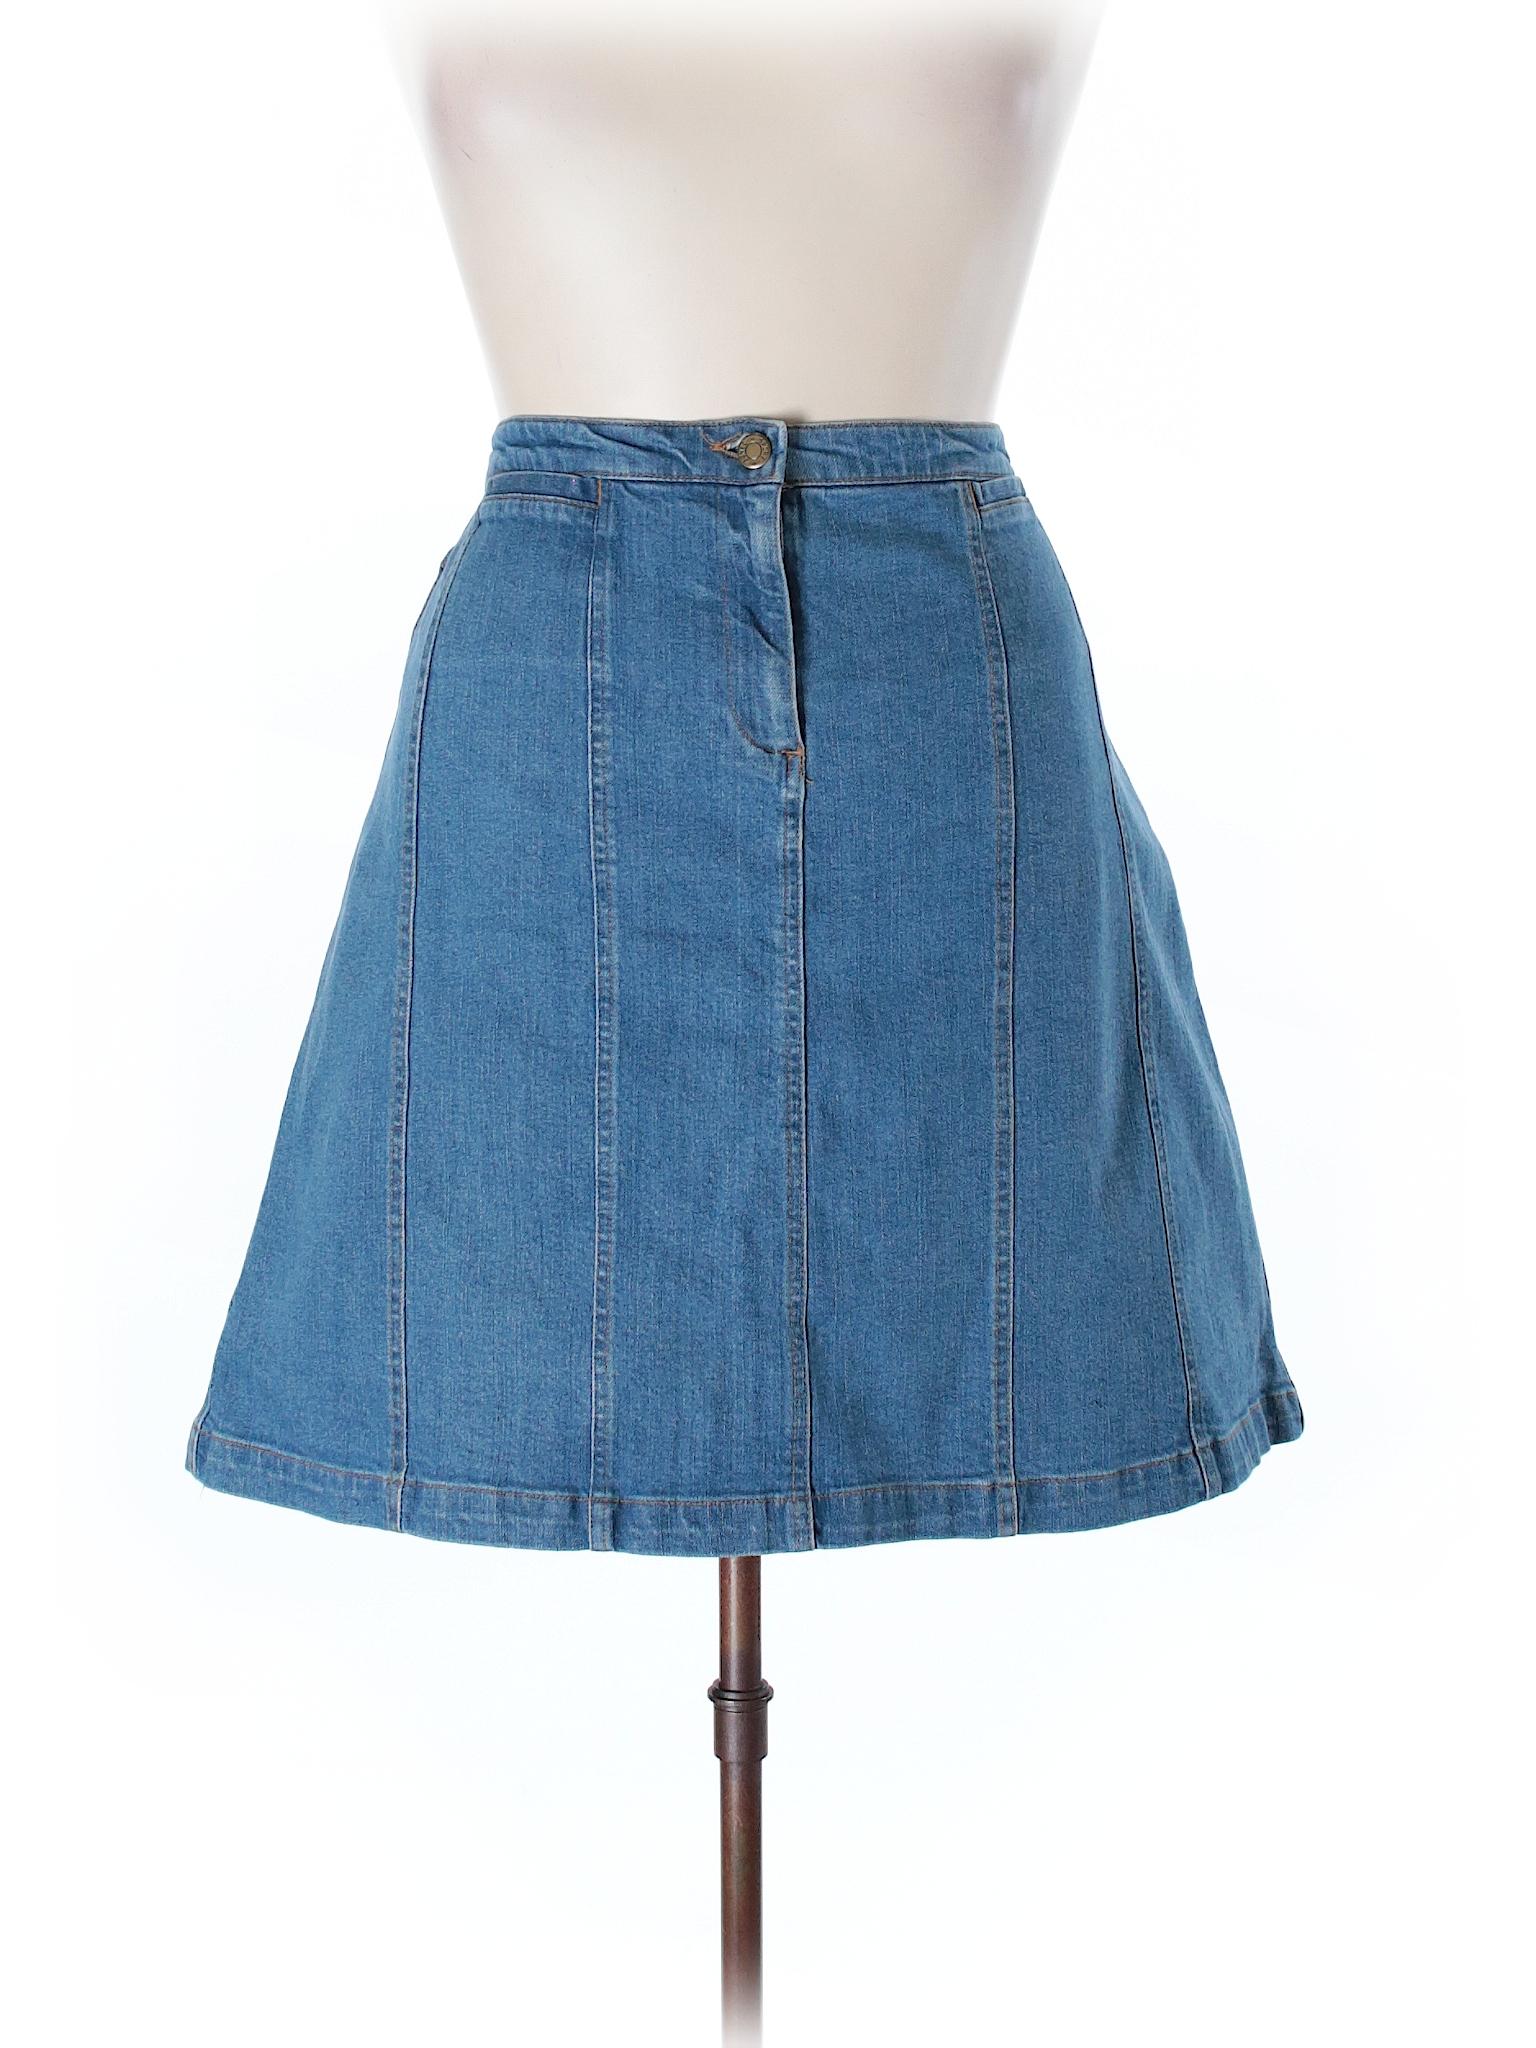 jones new york sport denim skirt 68 only on thredup